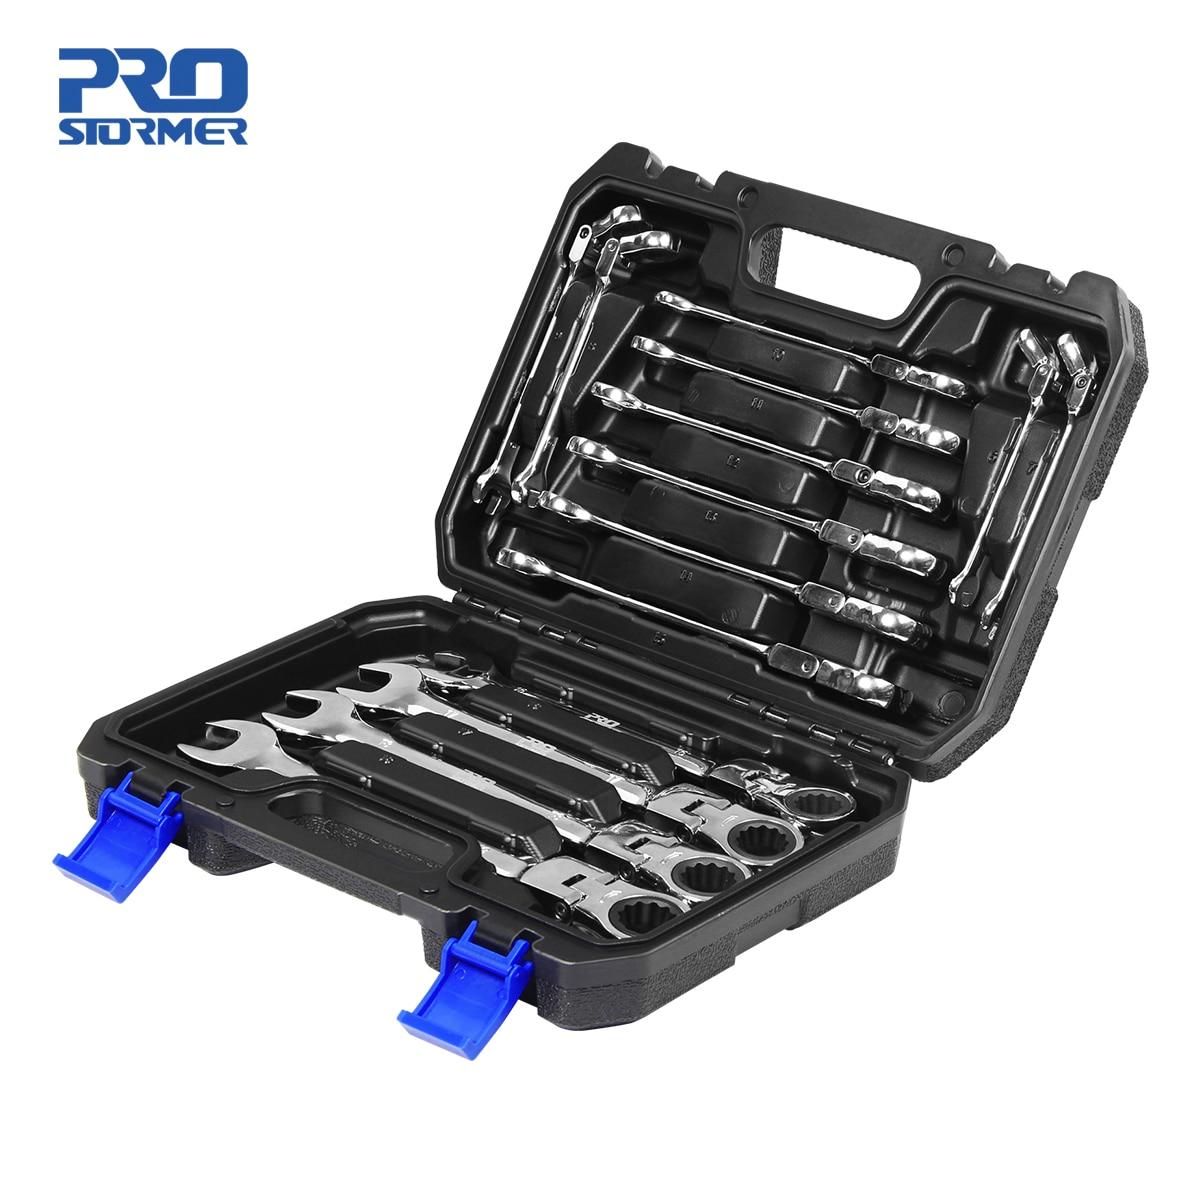 PROSTORMER 14PCS Keys Set Multitool Wrench Ratchet Spanners Set Hand Tool Wrench Set Universal Wrenc